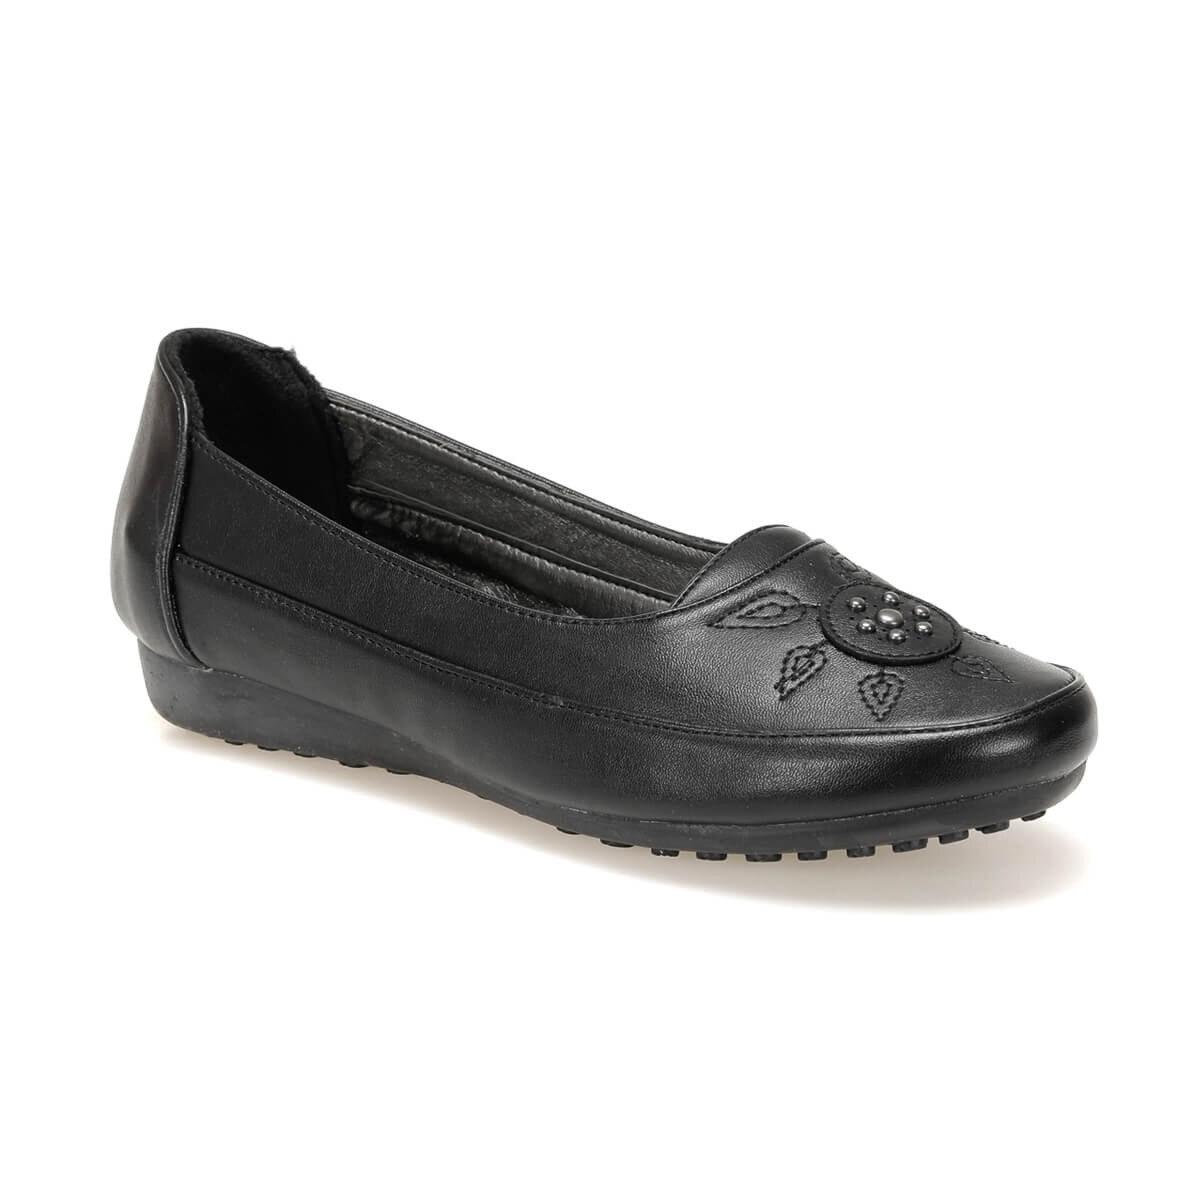 FLO 92.151009.Z Black Women Basic Comfort Polaris